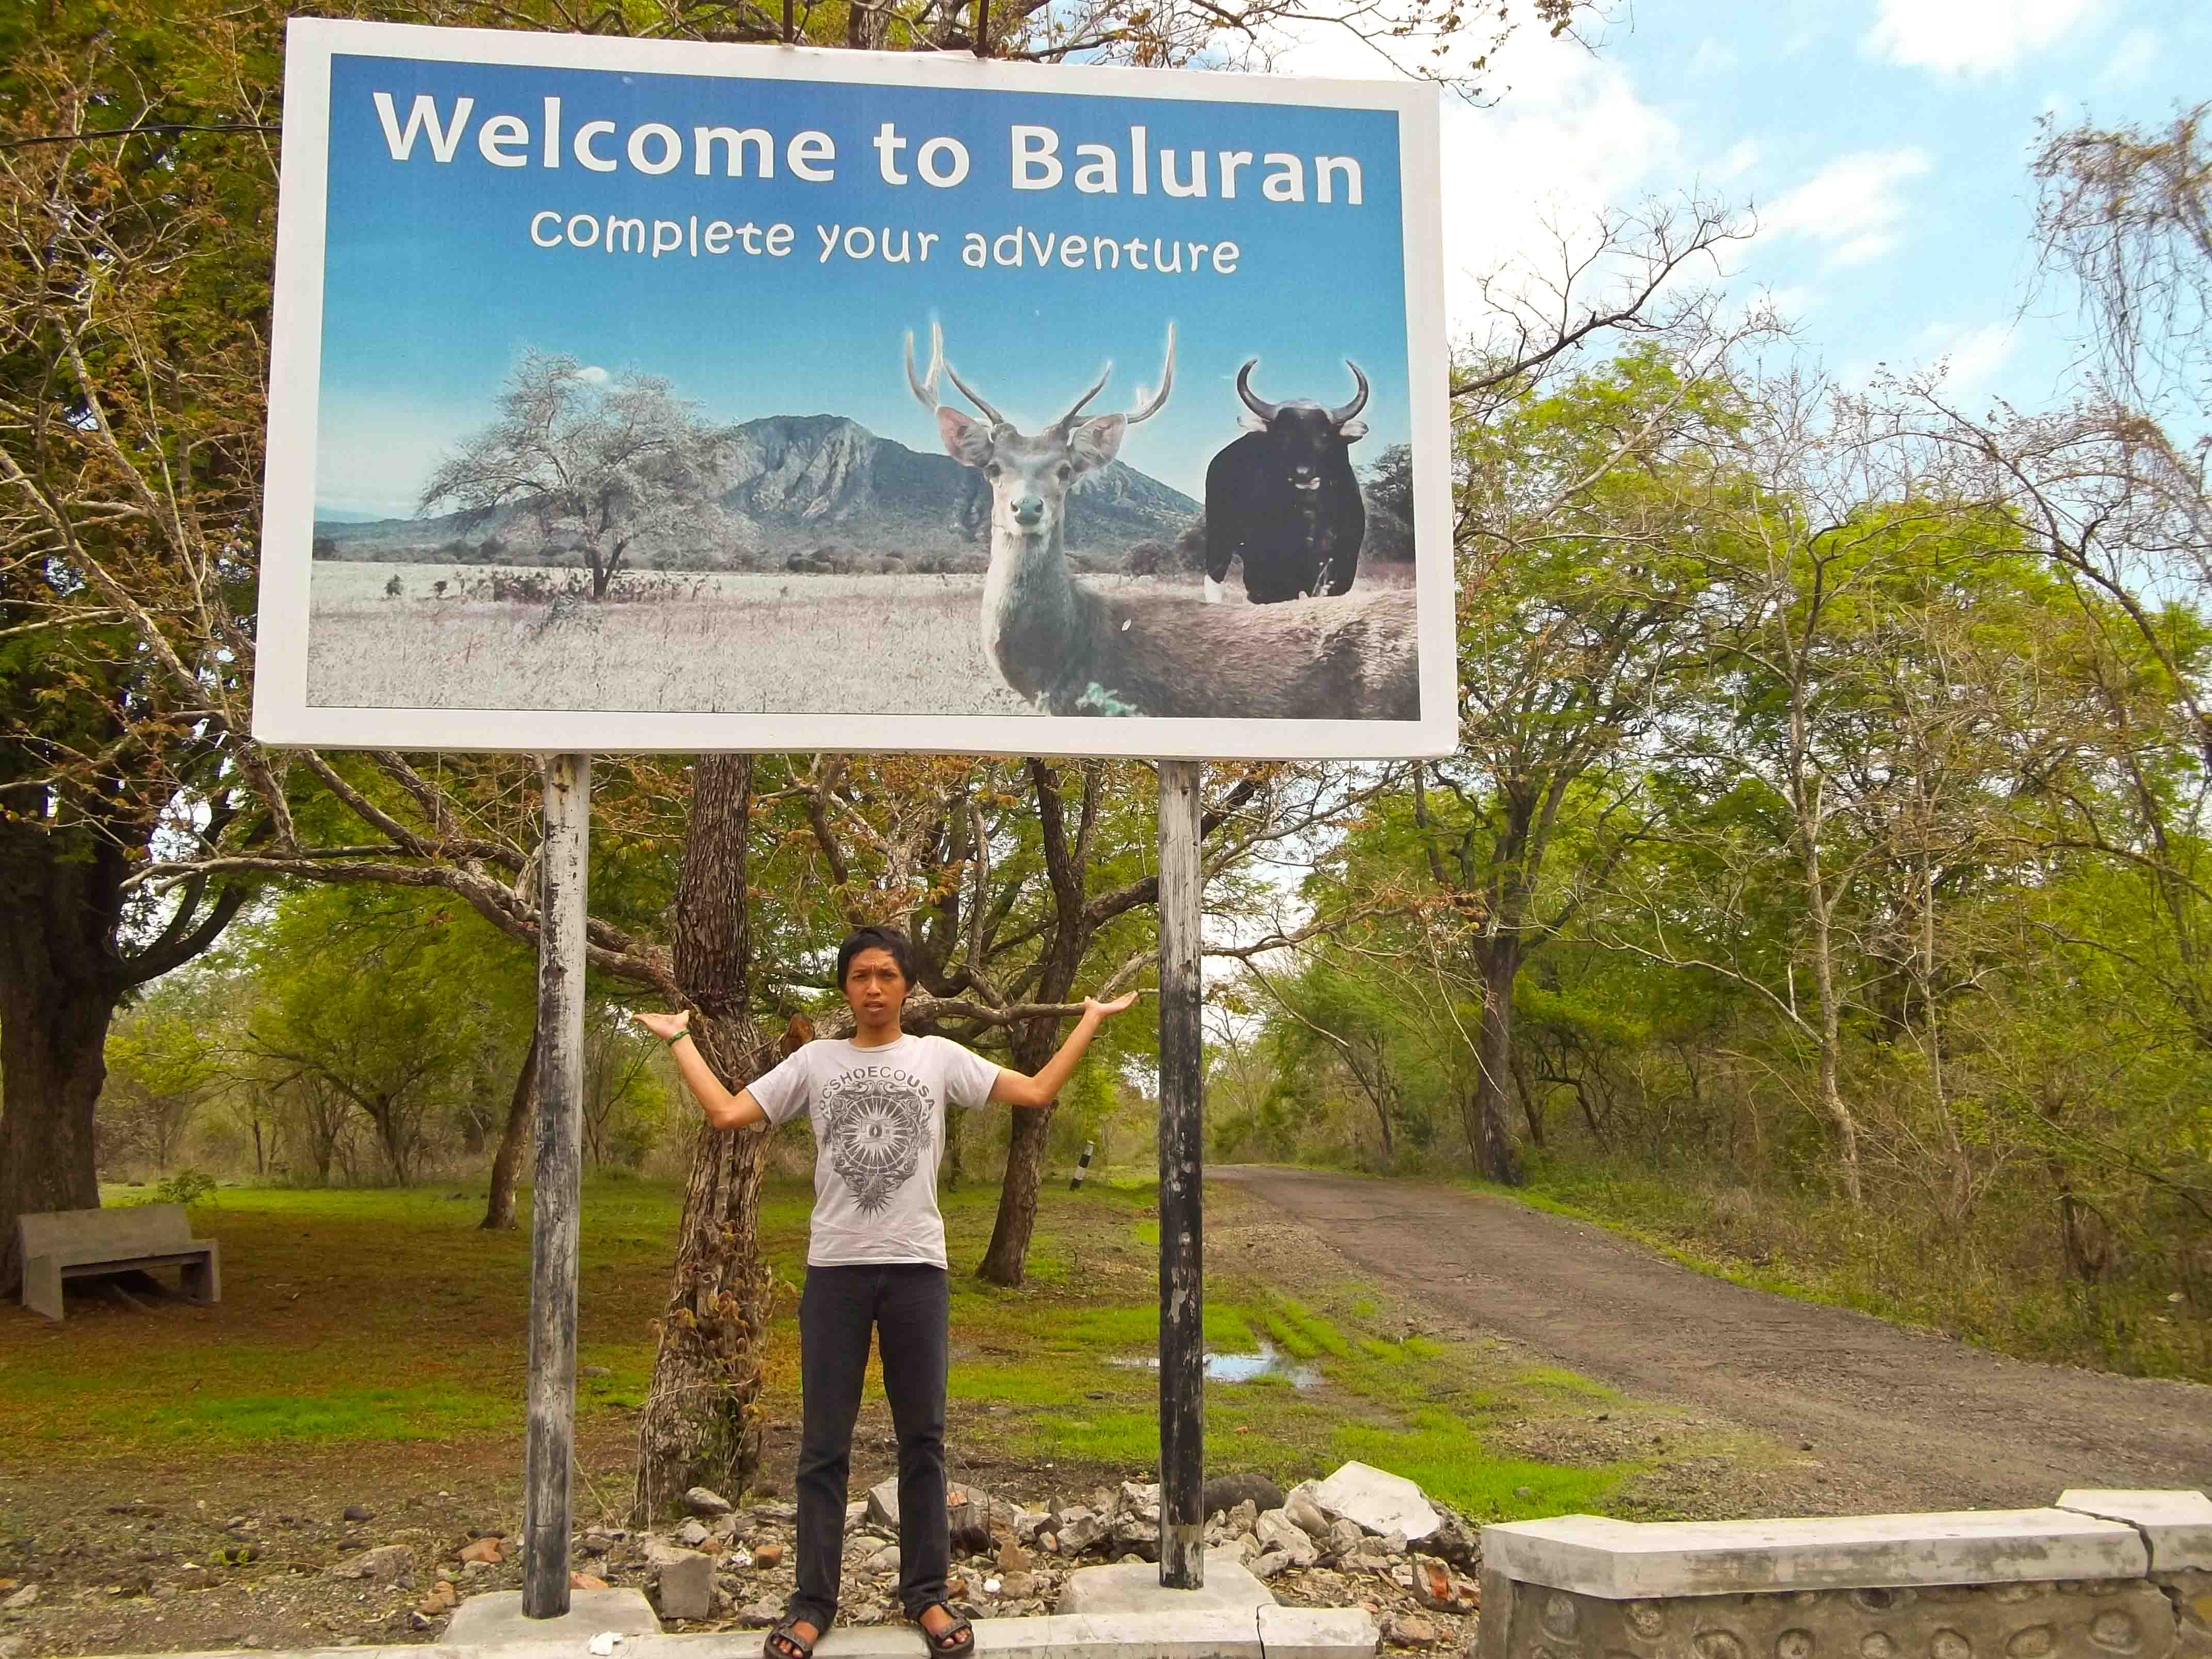 Secuil Kisah Tentang Taman Nasional Baluran - Kompasiana.com